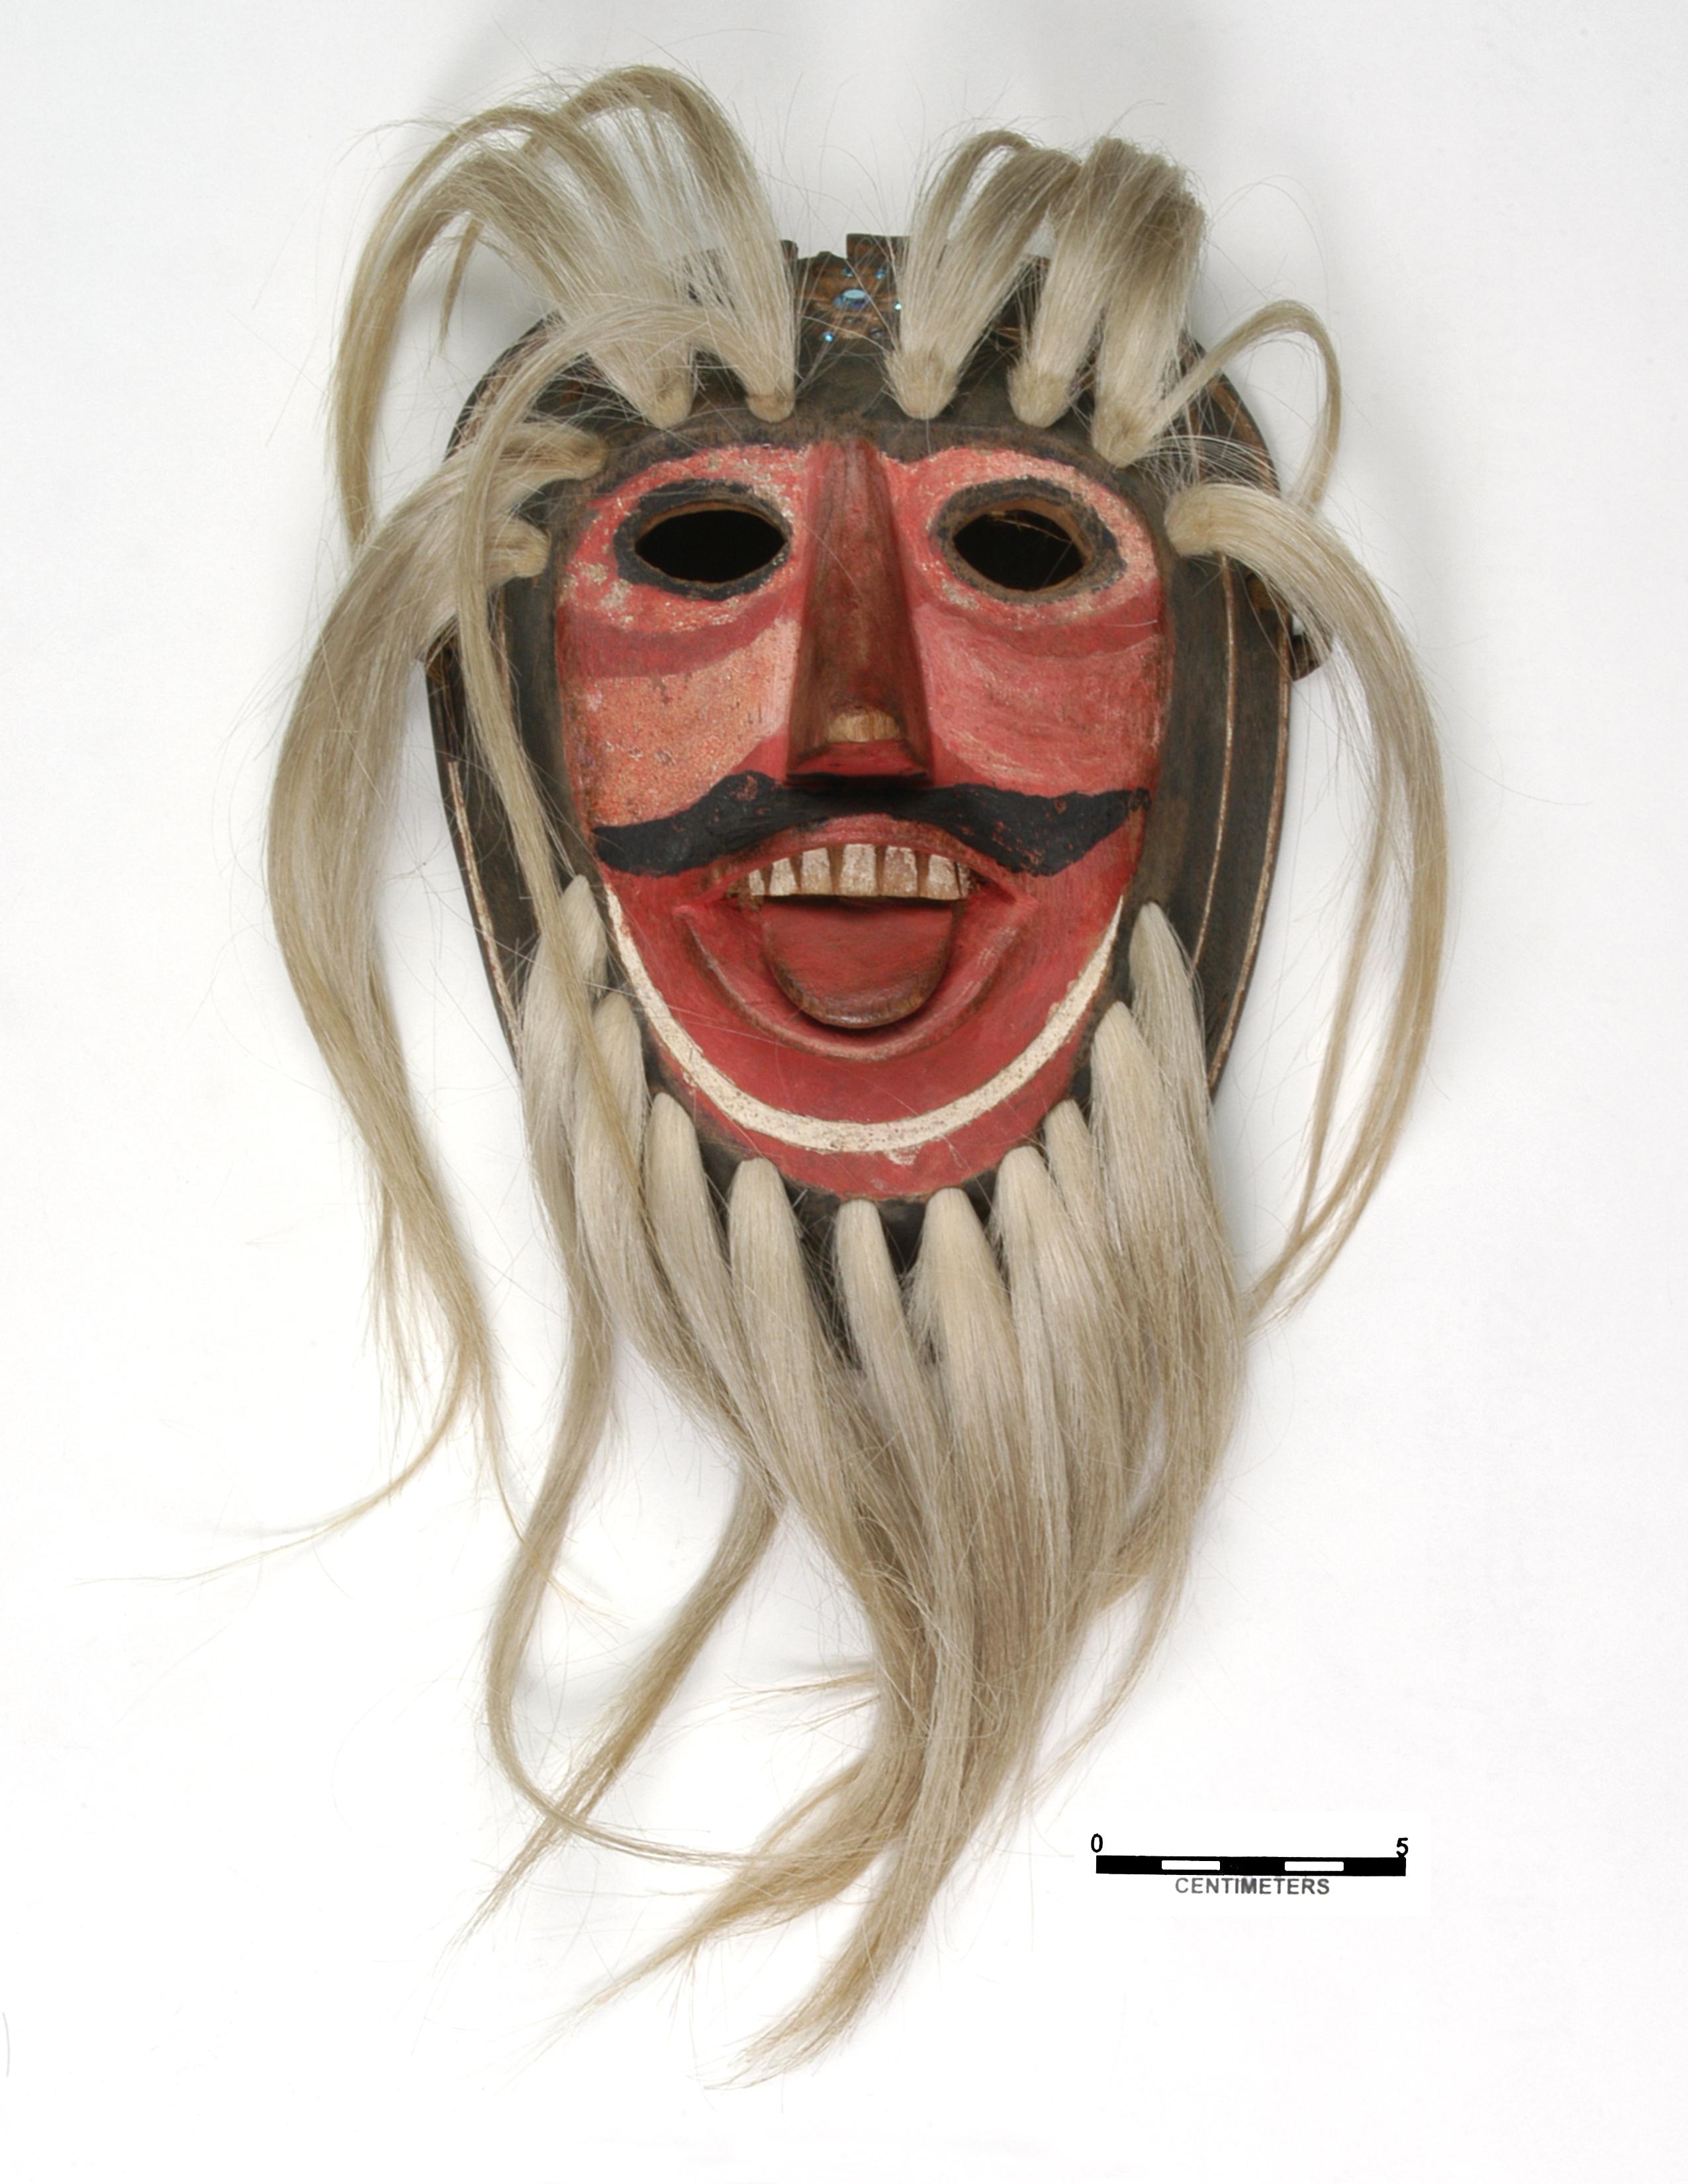 Maker: Benito Moroyoki, Embarcadero; made in 1965, acquired 1965